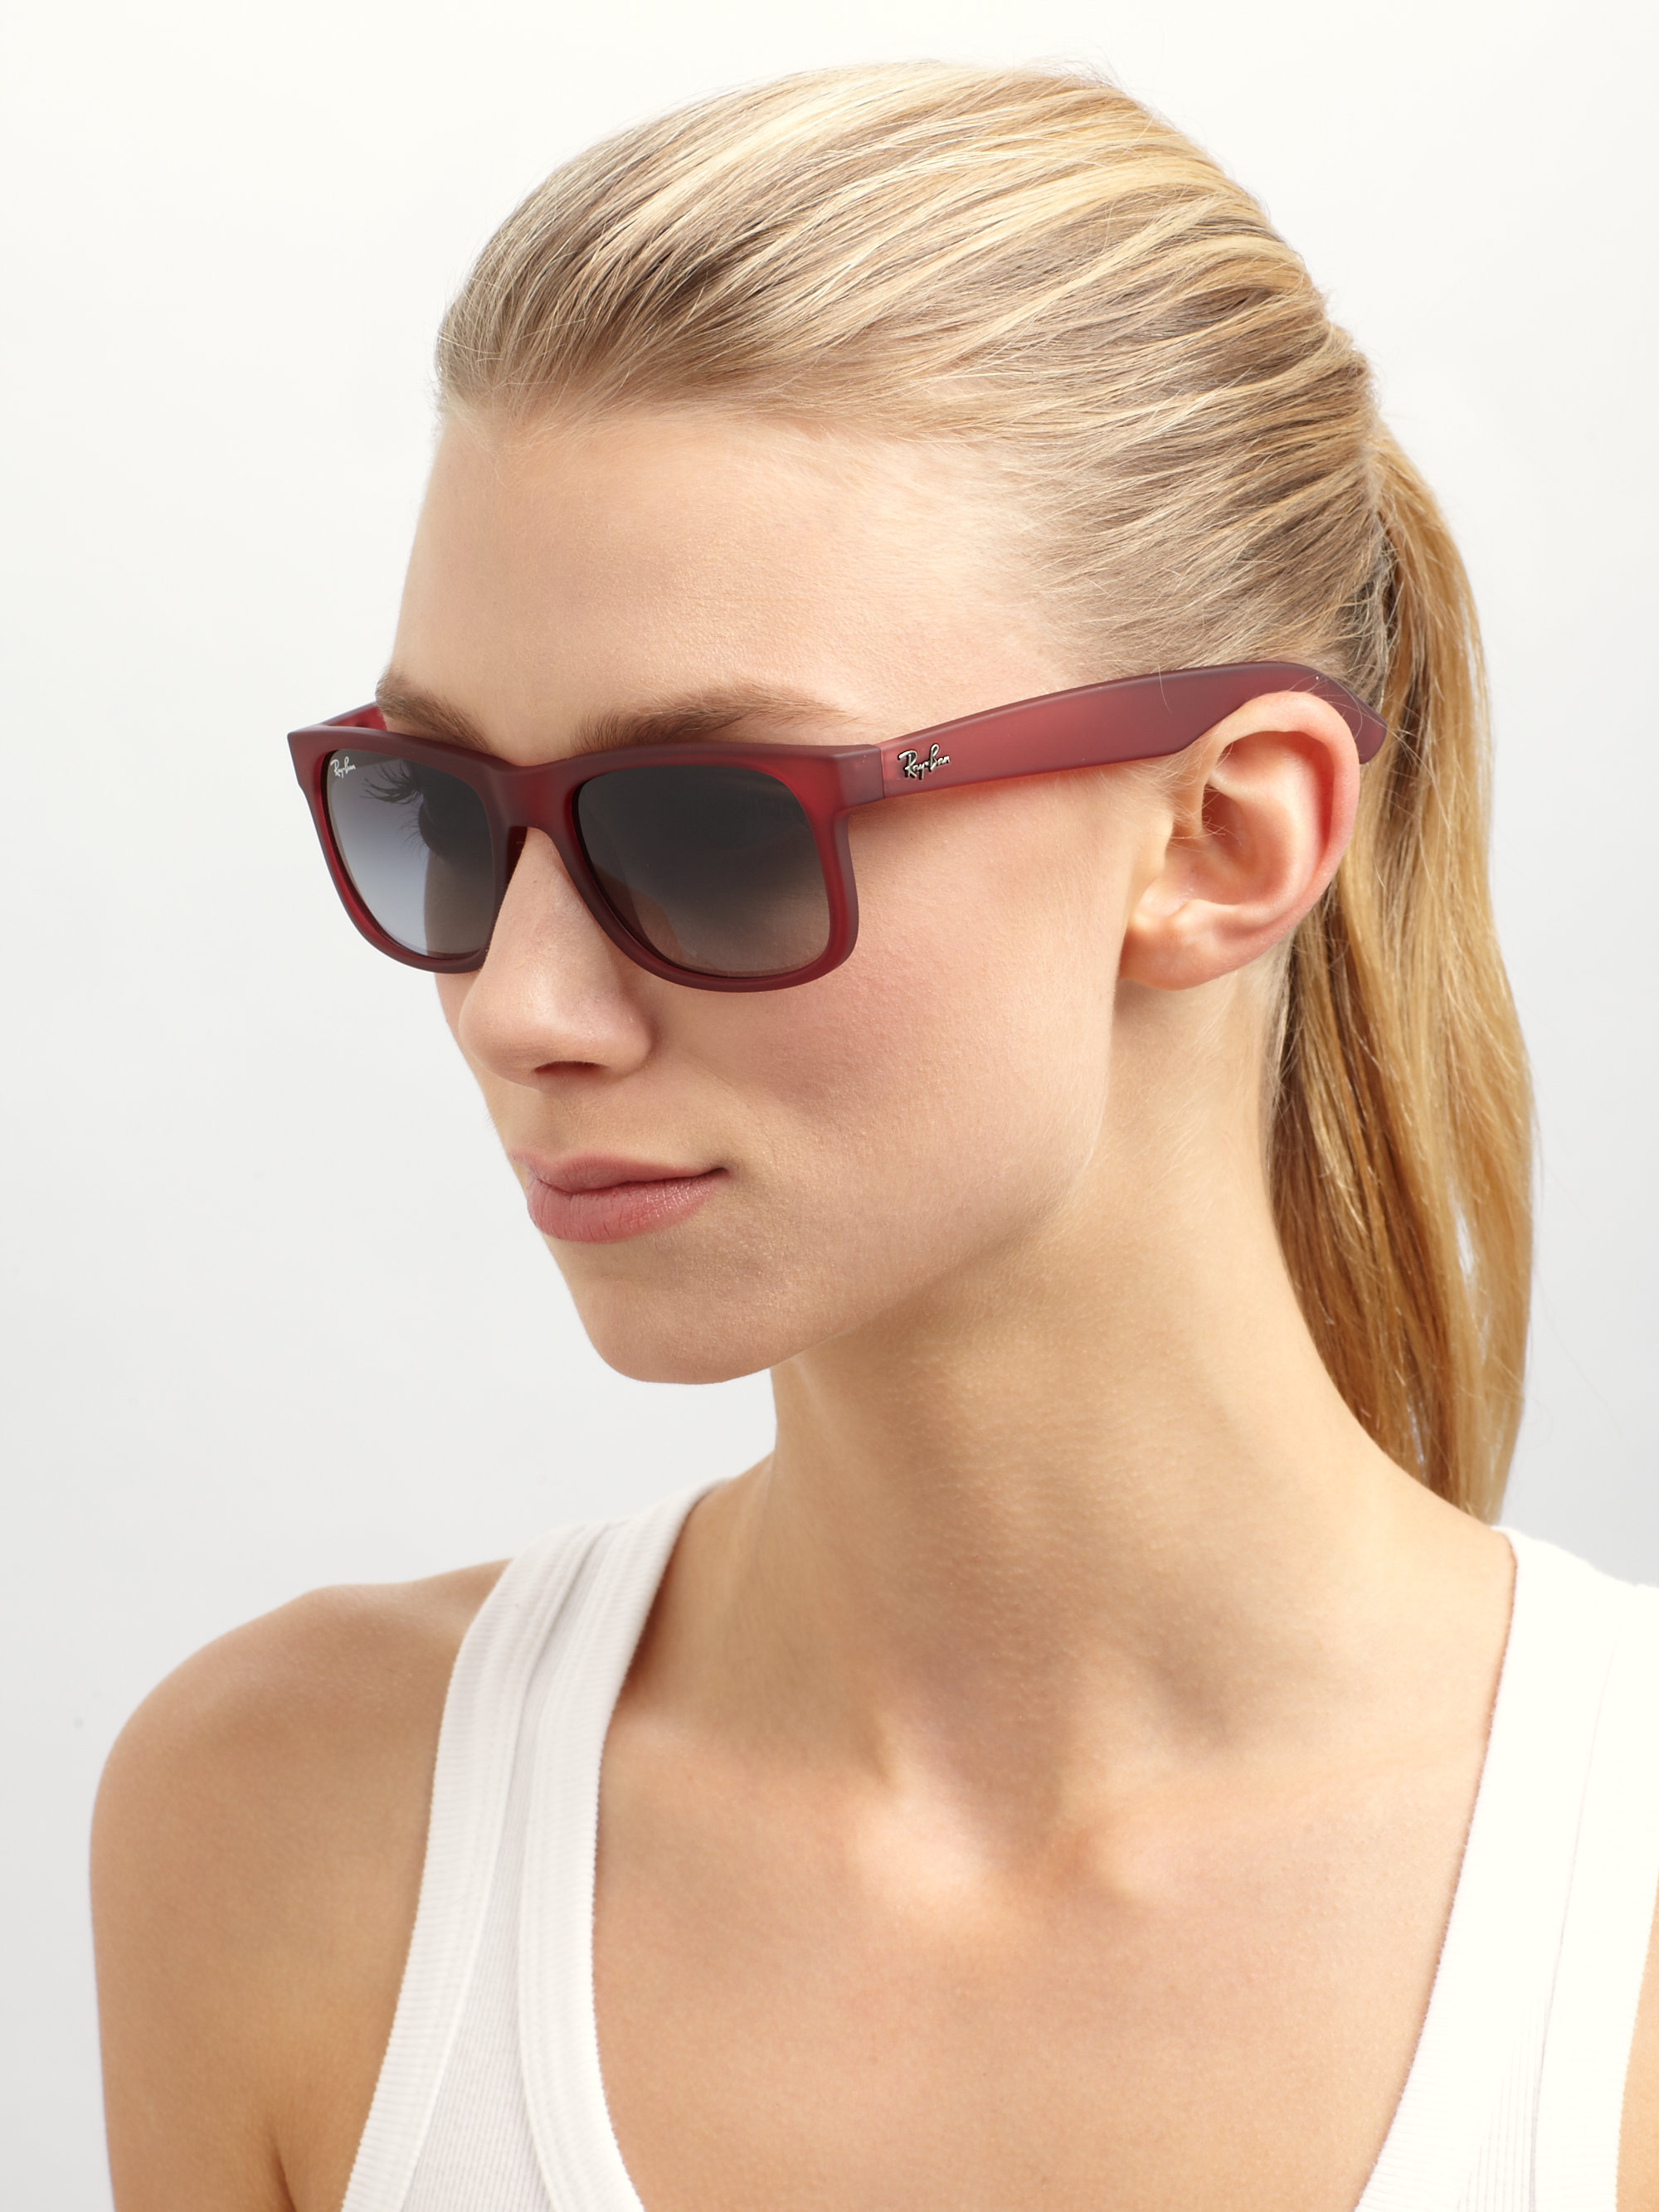 dbaaec73fa9 ... order lyst ray ban justin rubber wayfarer sunglasses in green b1498  6d2c9